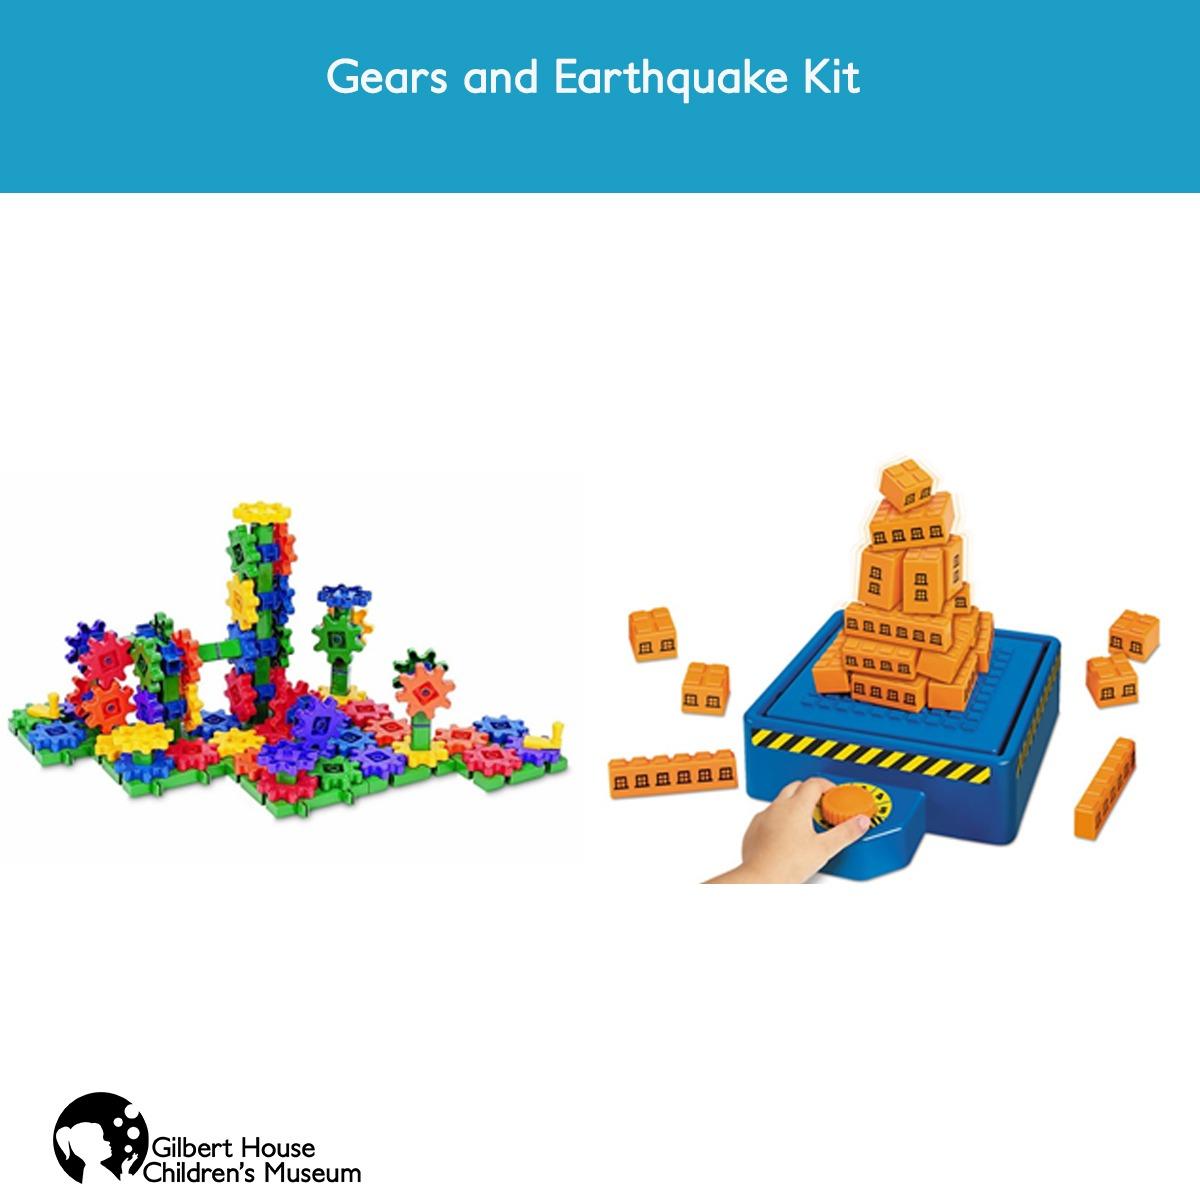 Gears and Earthquake Kit